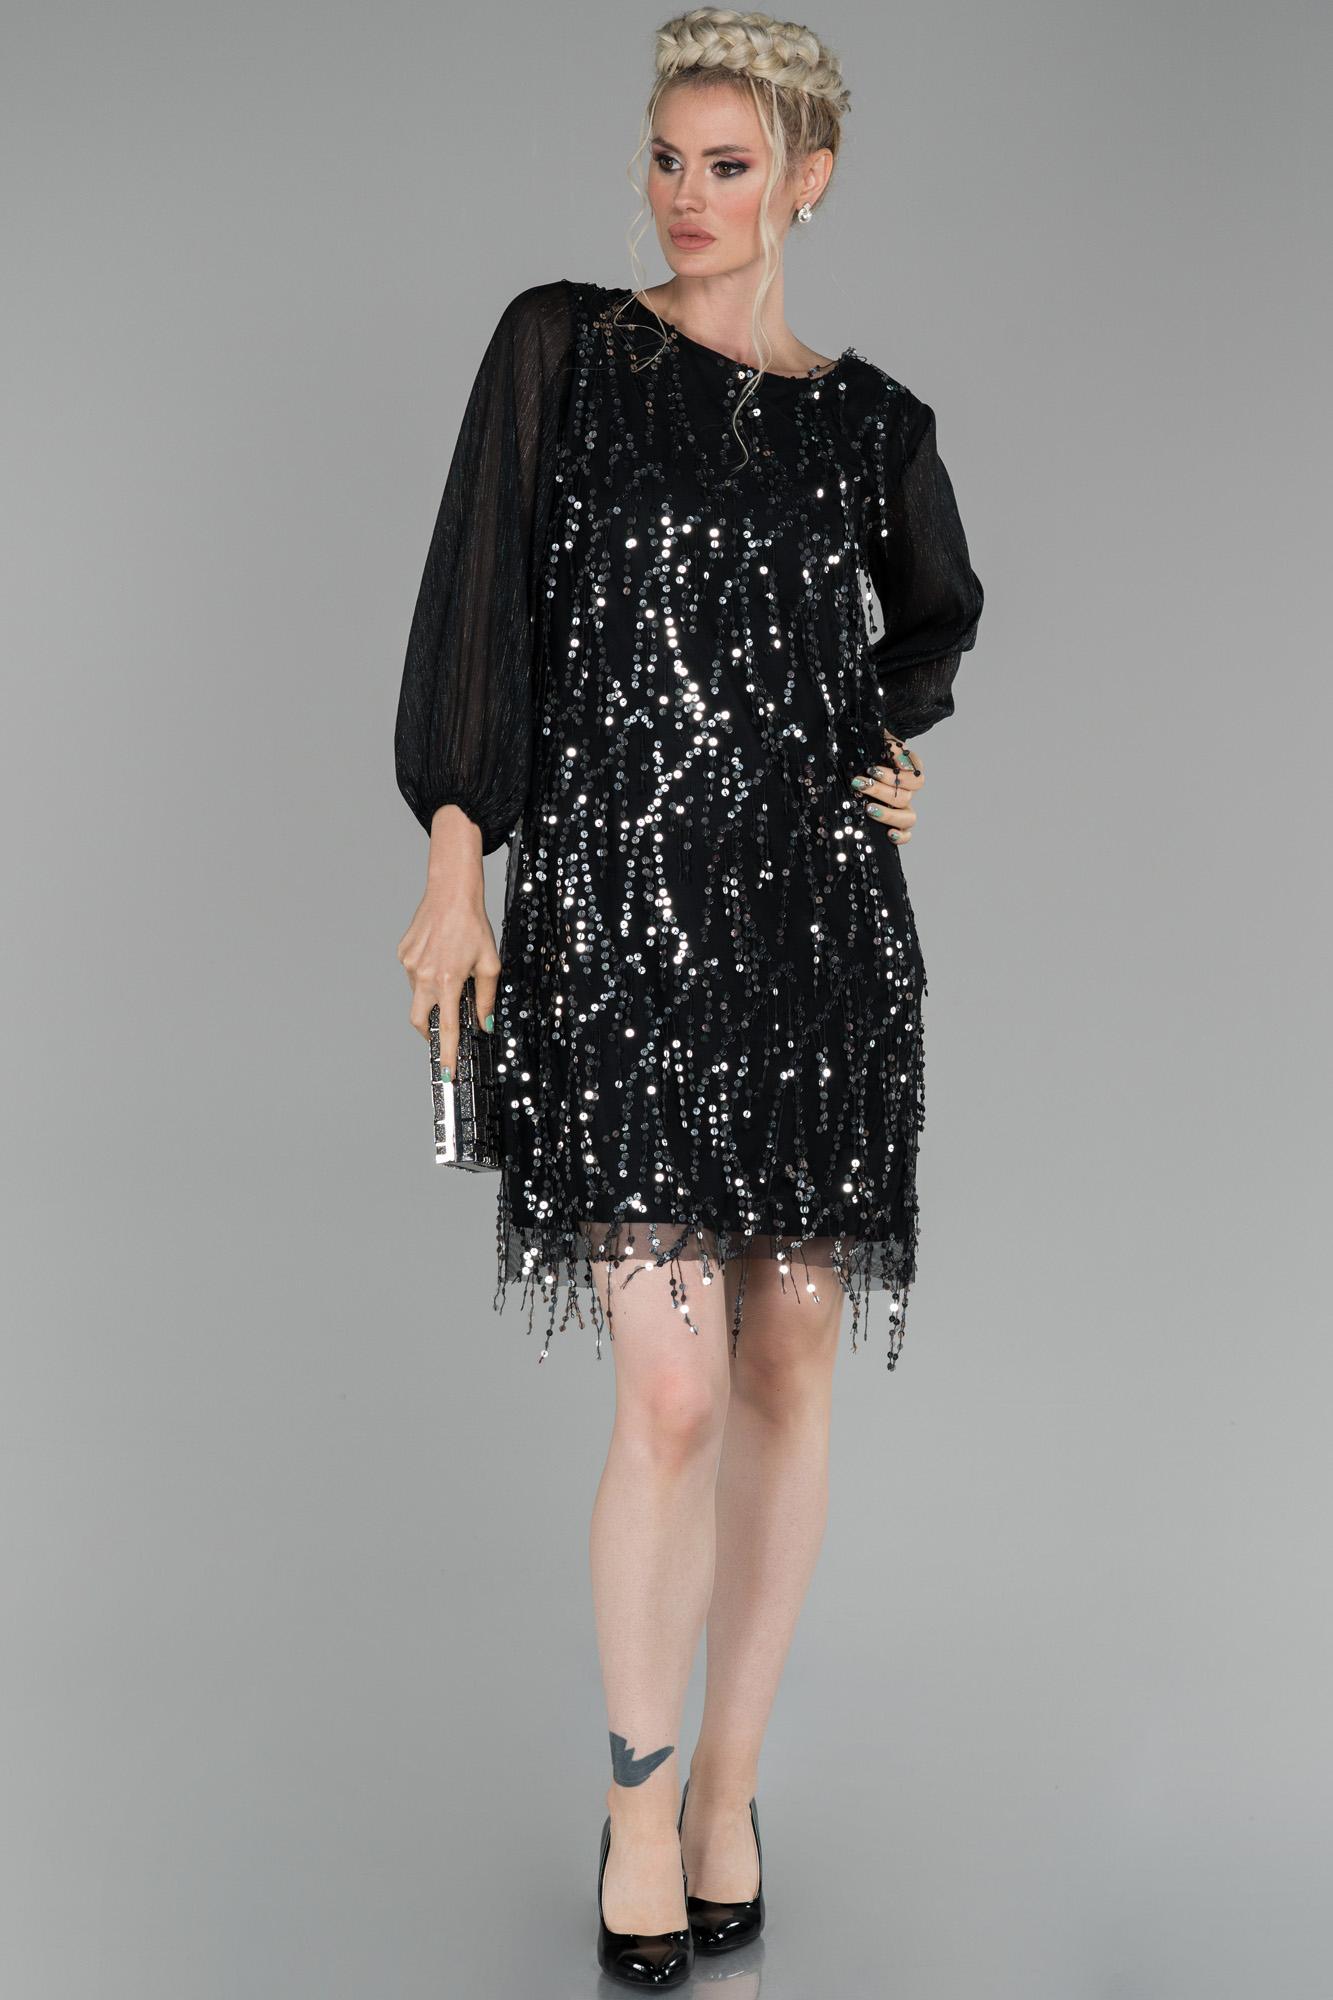 Siyah-Gümüş Mini Pul Payet Işlemeli Davet Elbisesi